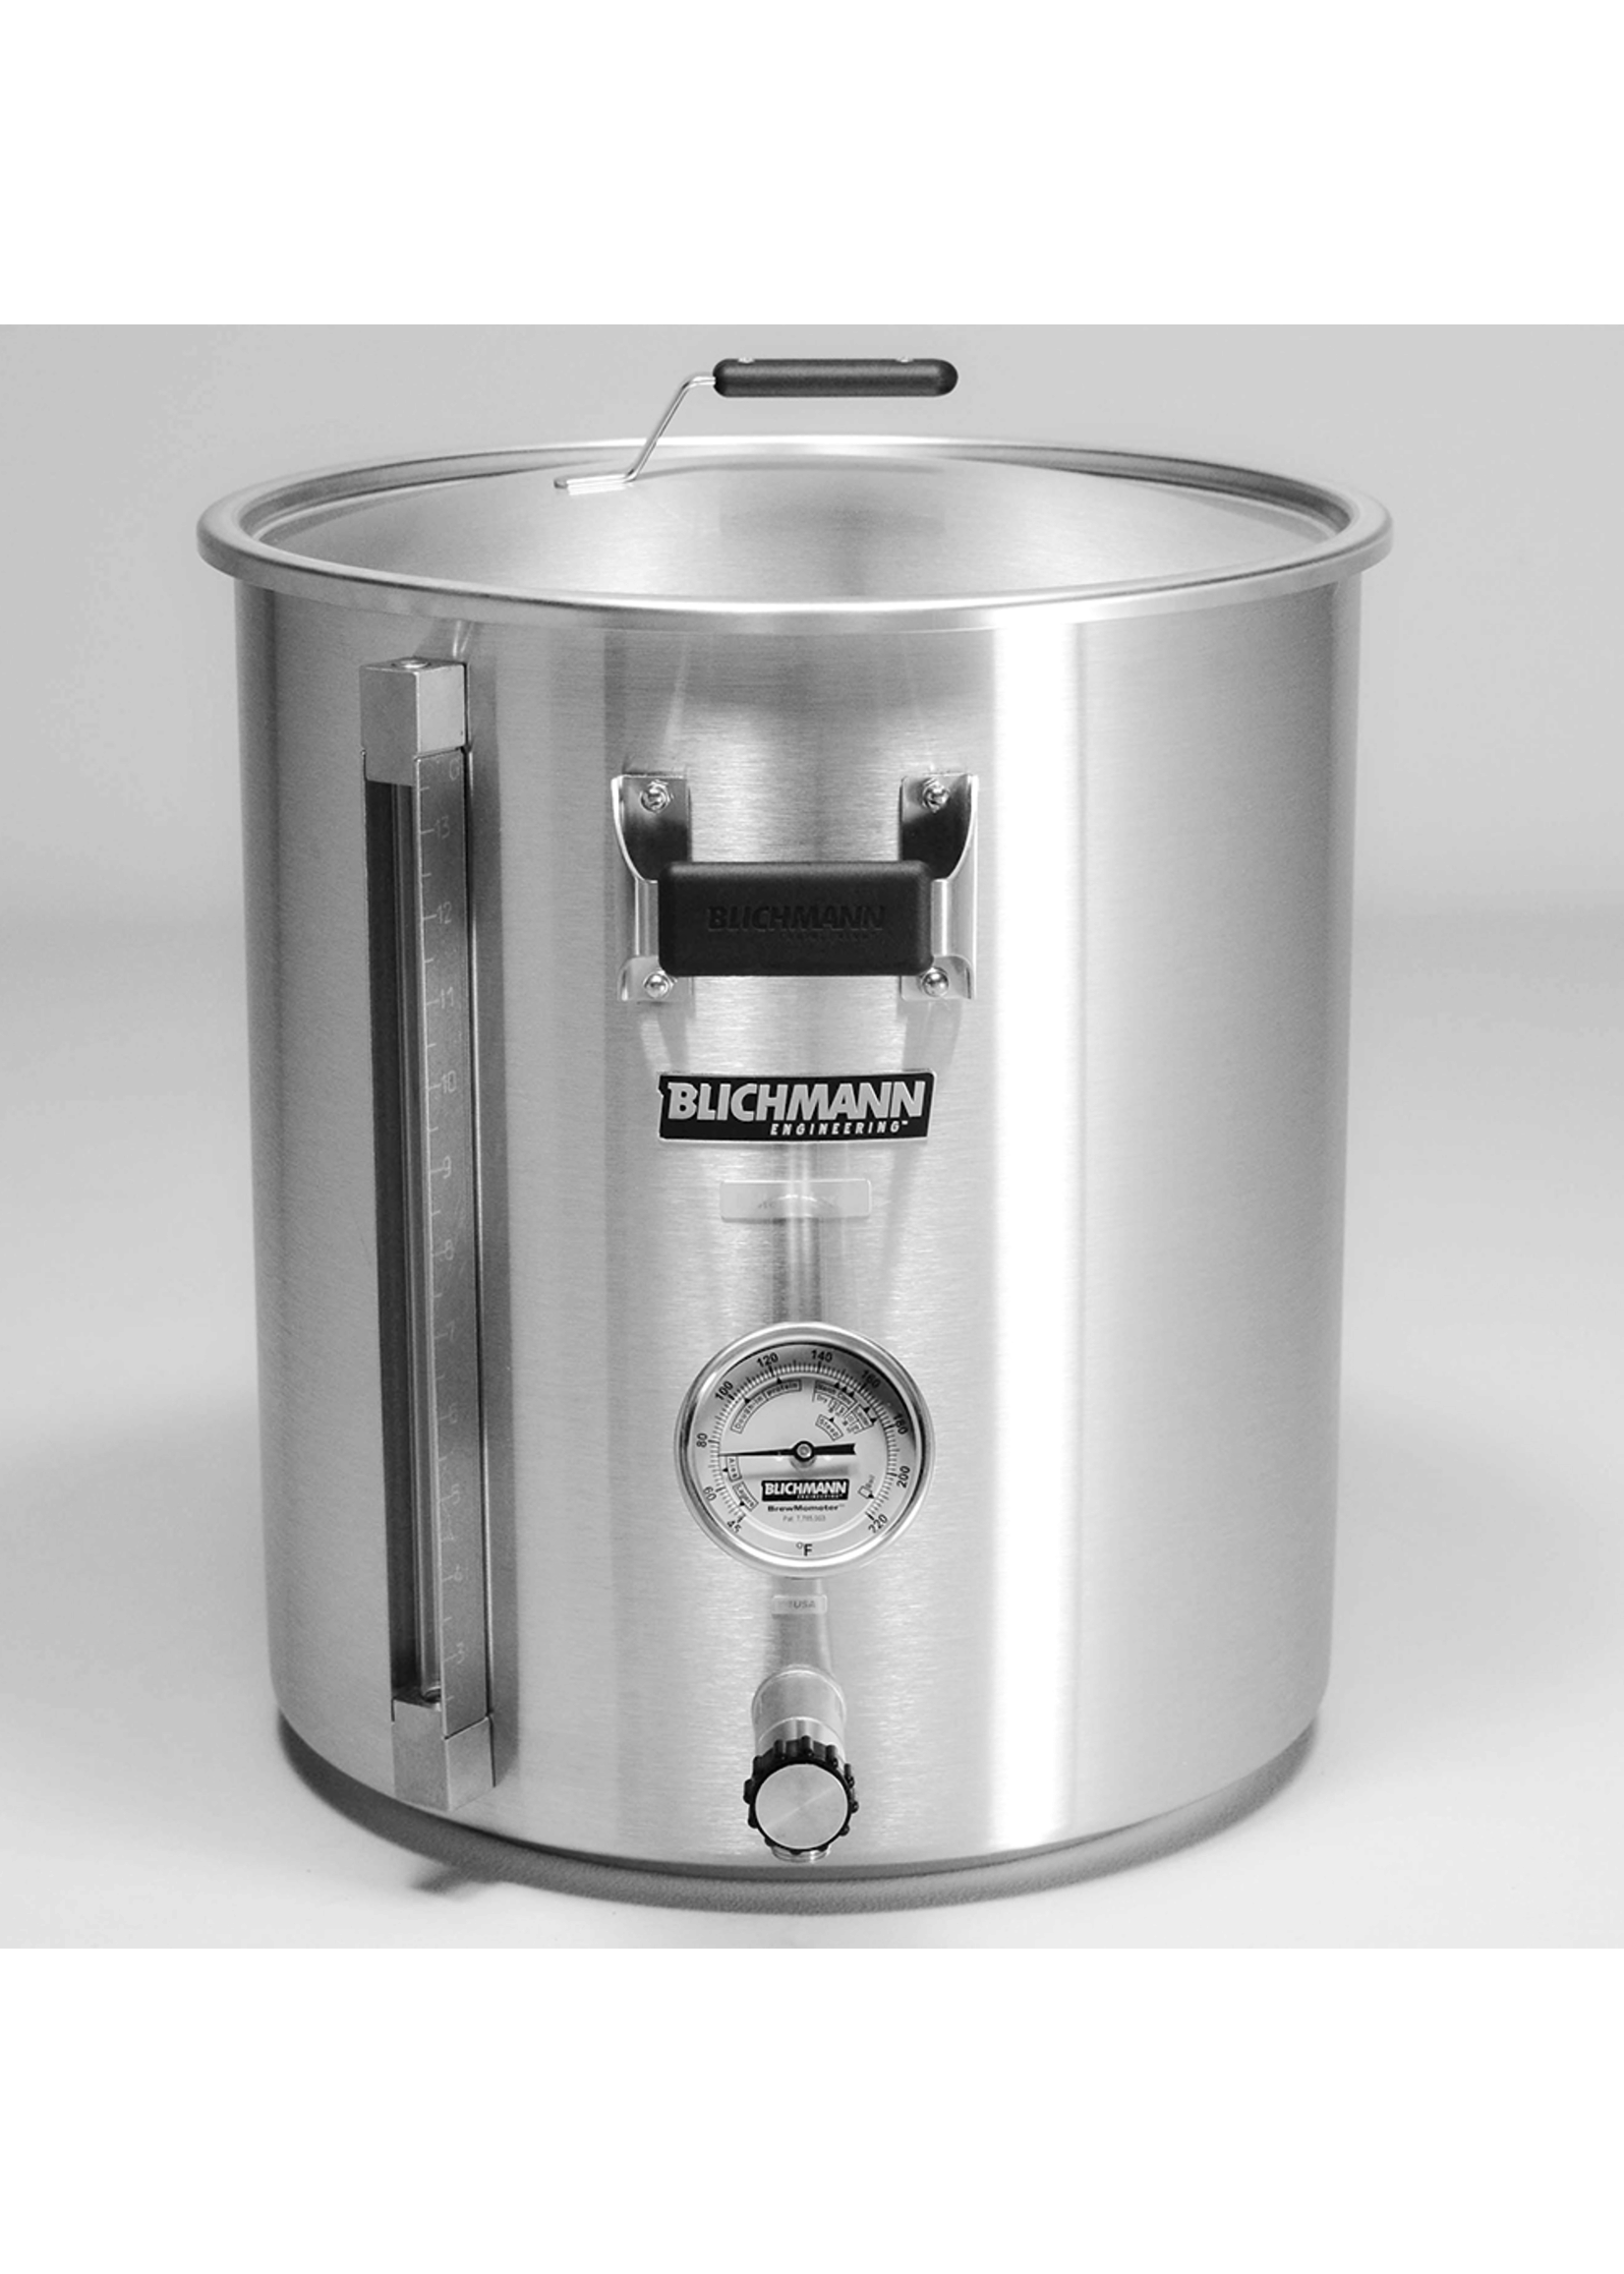 Blichmann Blichmann BoilerMaker G2 - 15 Gallon Standard Brew Kettle (Fahrenheit)